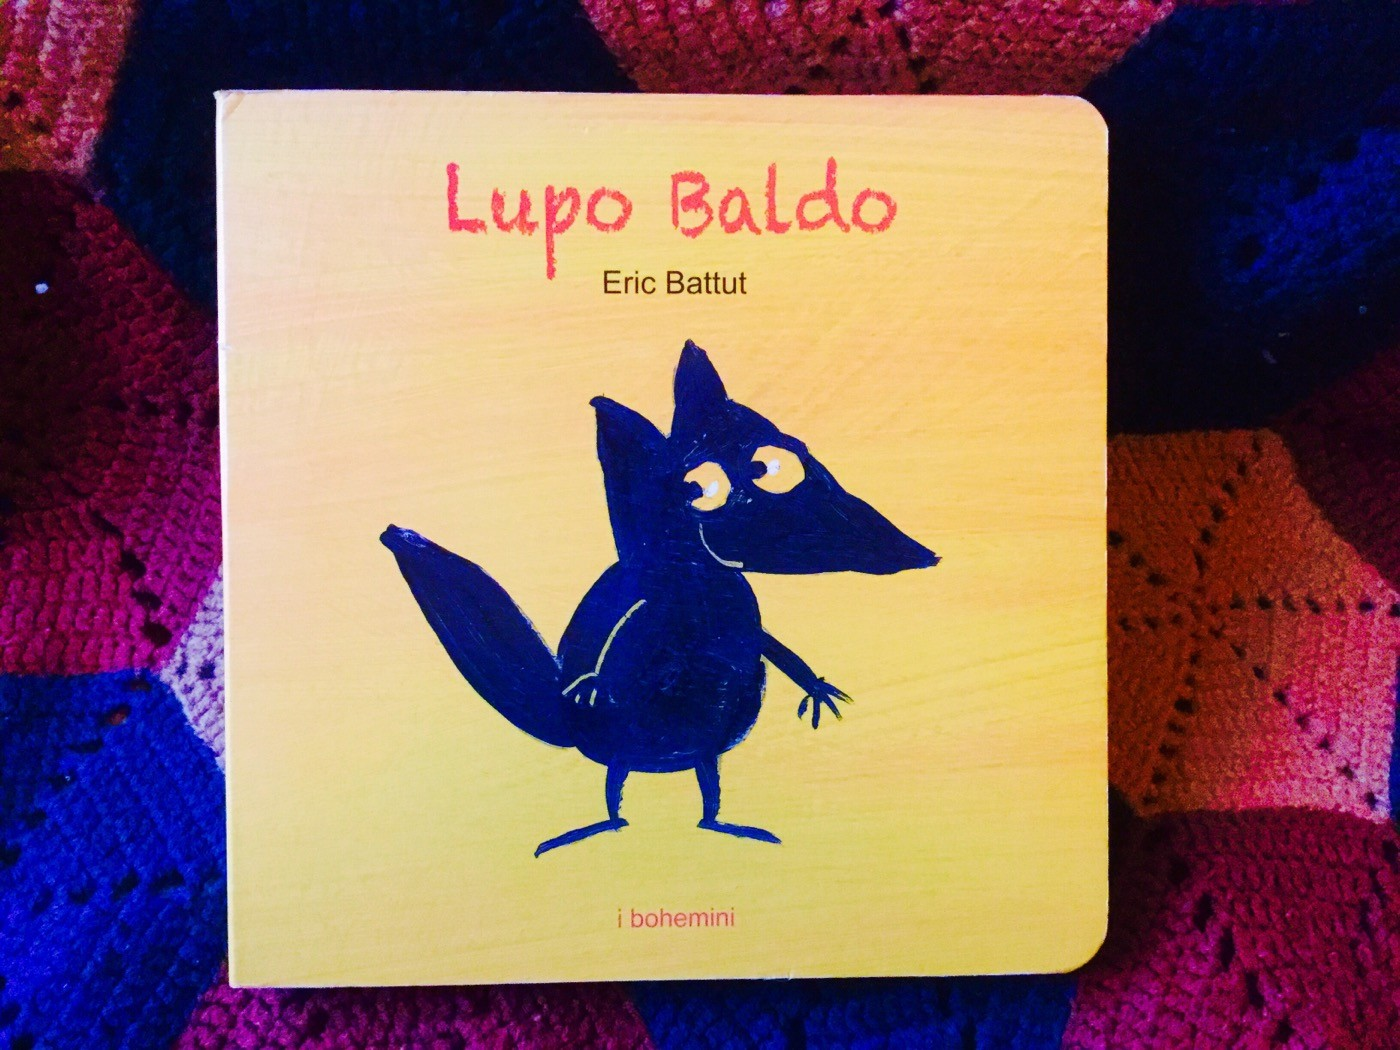 Lupo-Baldo-Battut-Bohem-Press-Galline-Volanti